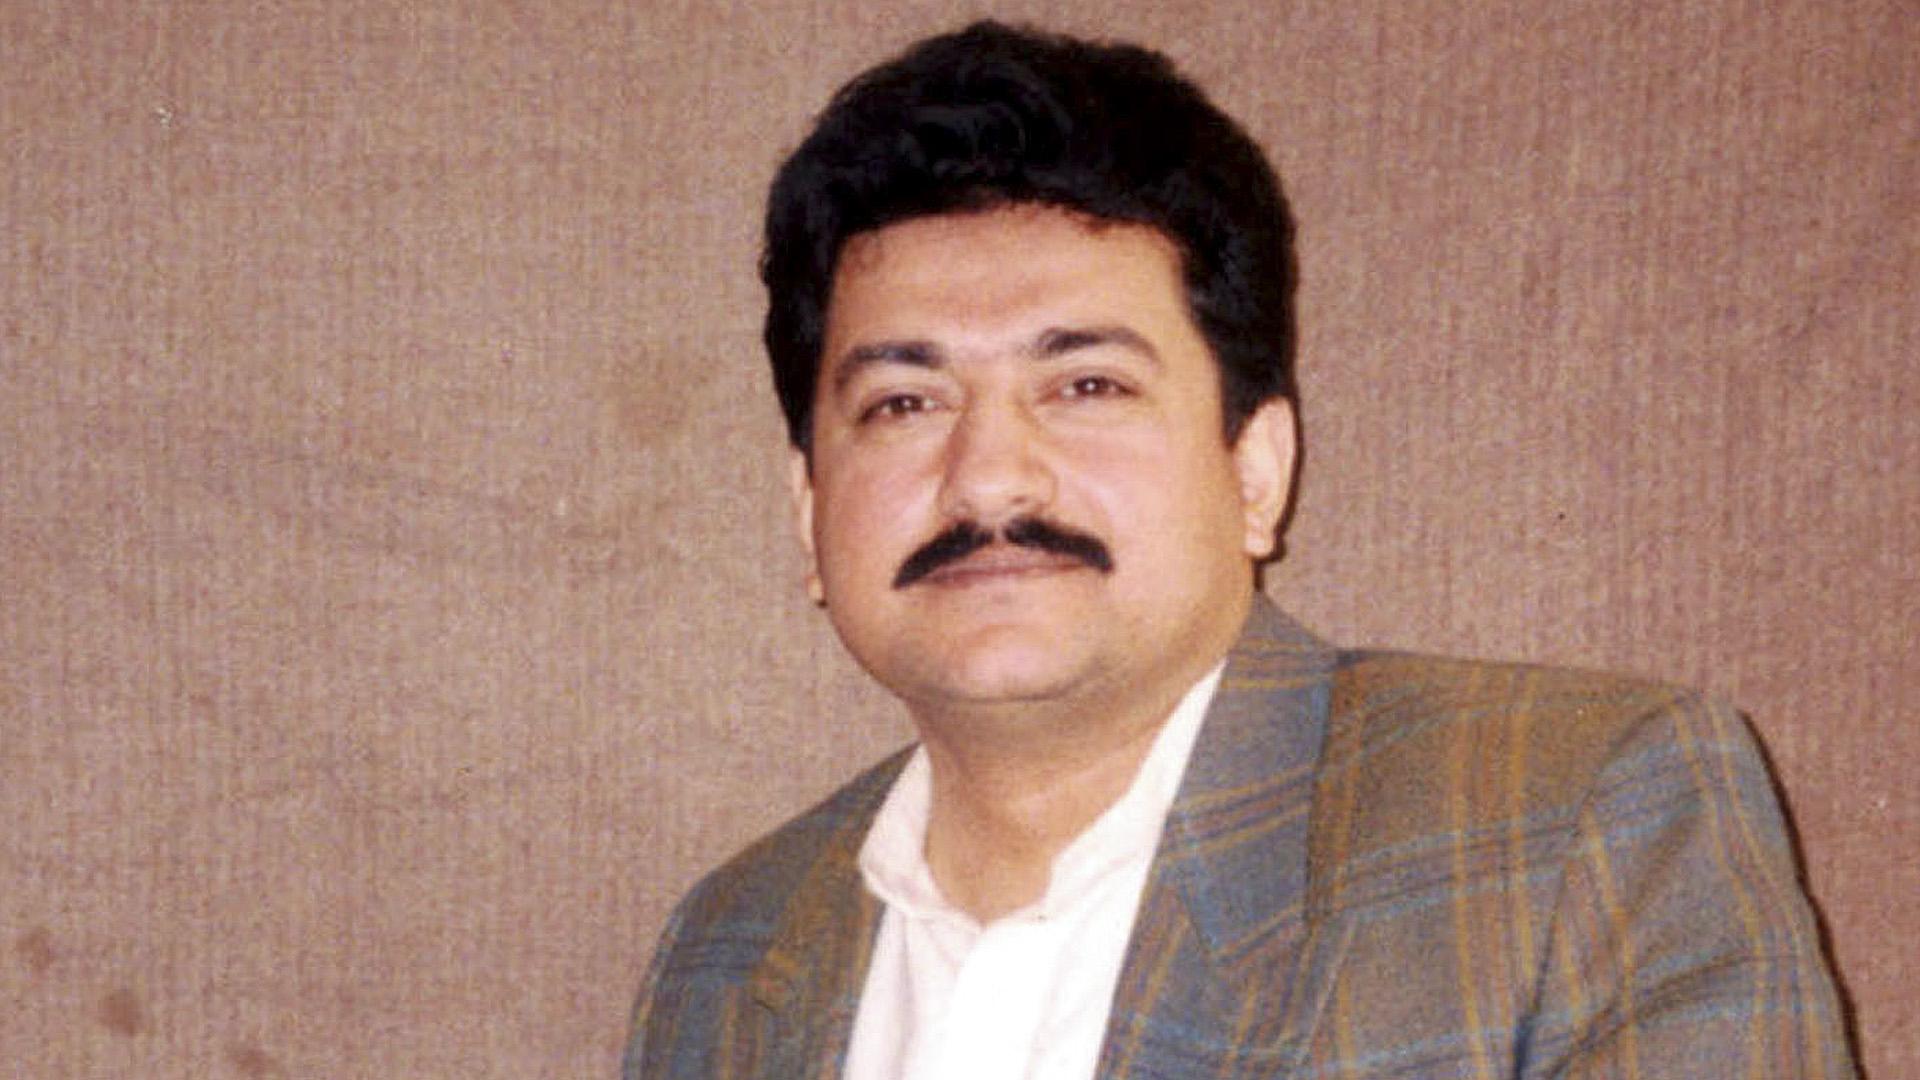 Pakistan Journalist Hamid Mir Taken Off-Air For Criticizing Army